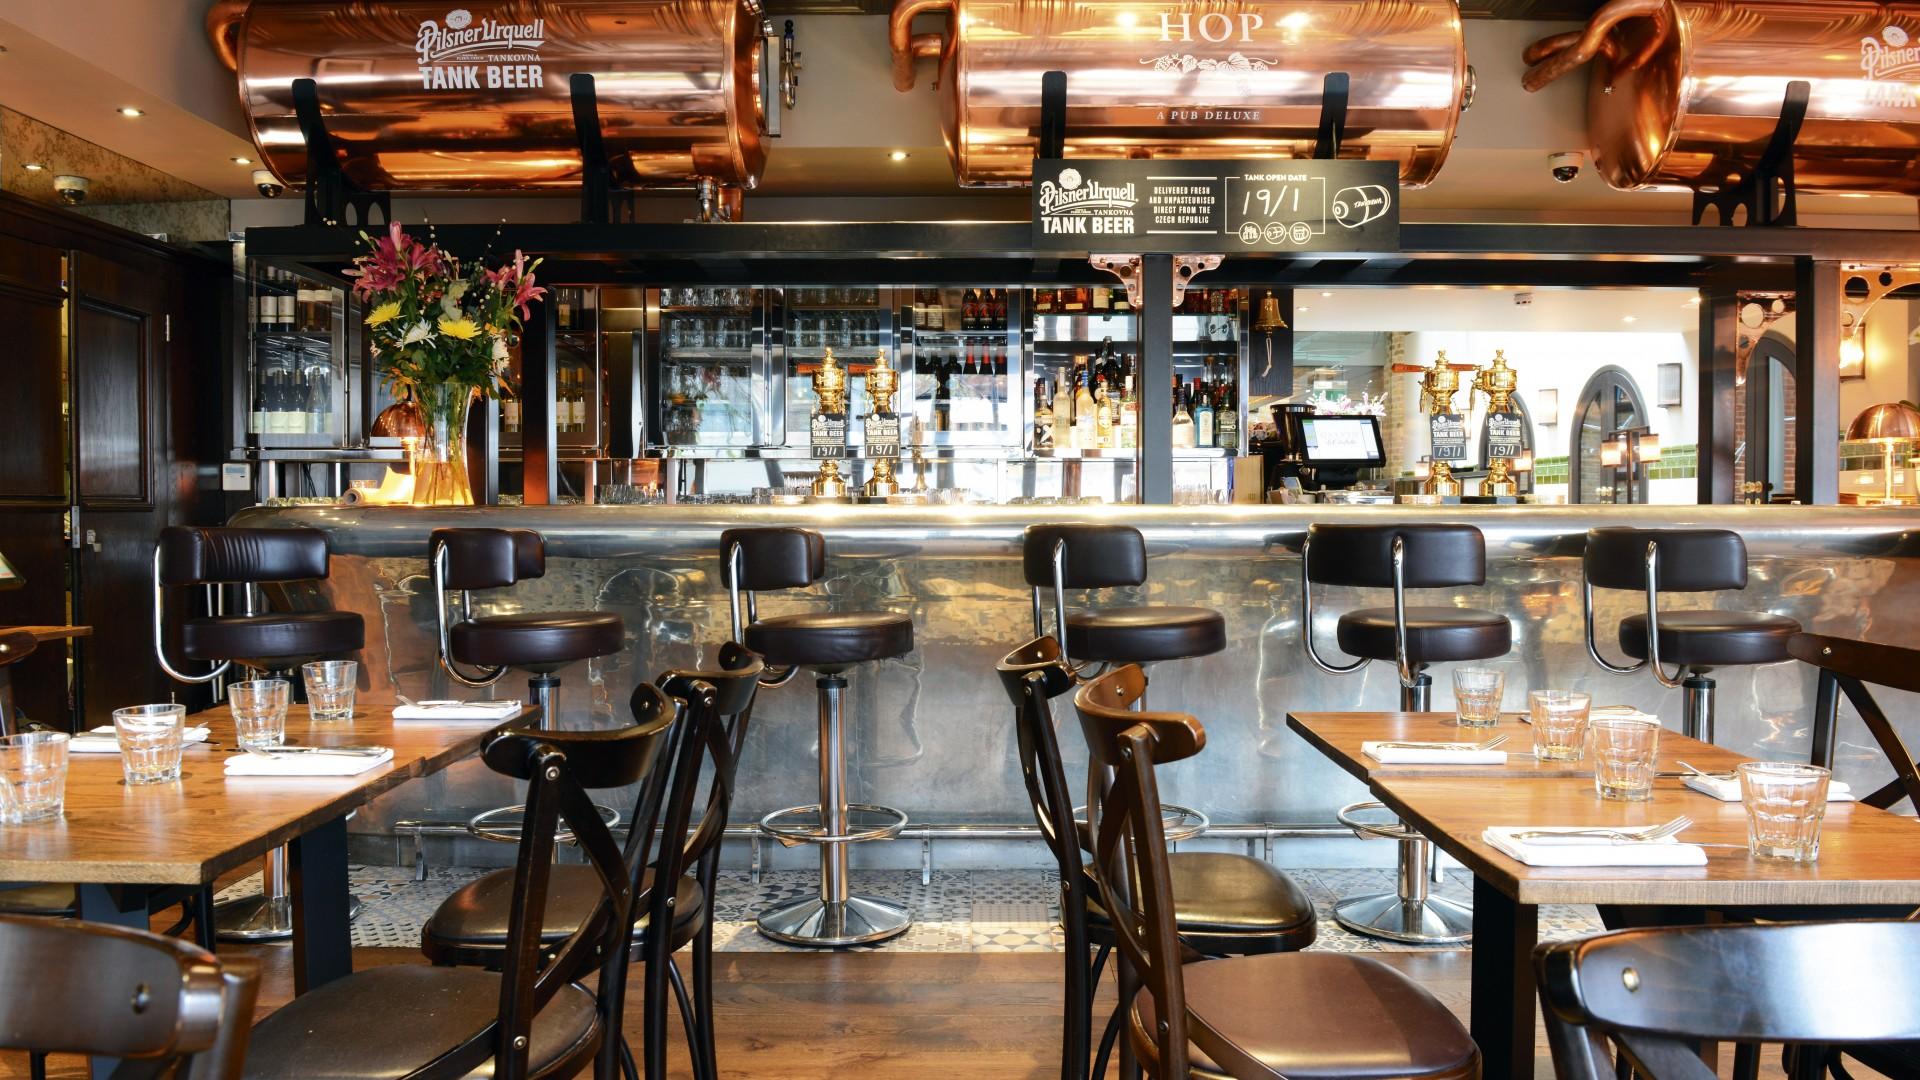 Galvin HOP pub, Square Mile Pub Awards 2017 Winner